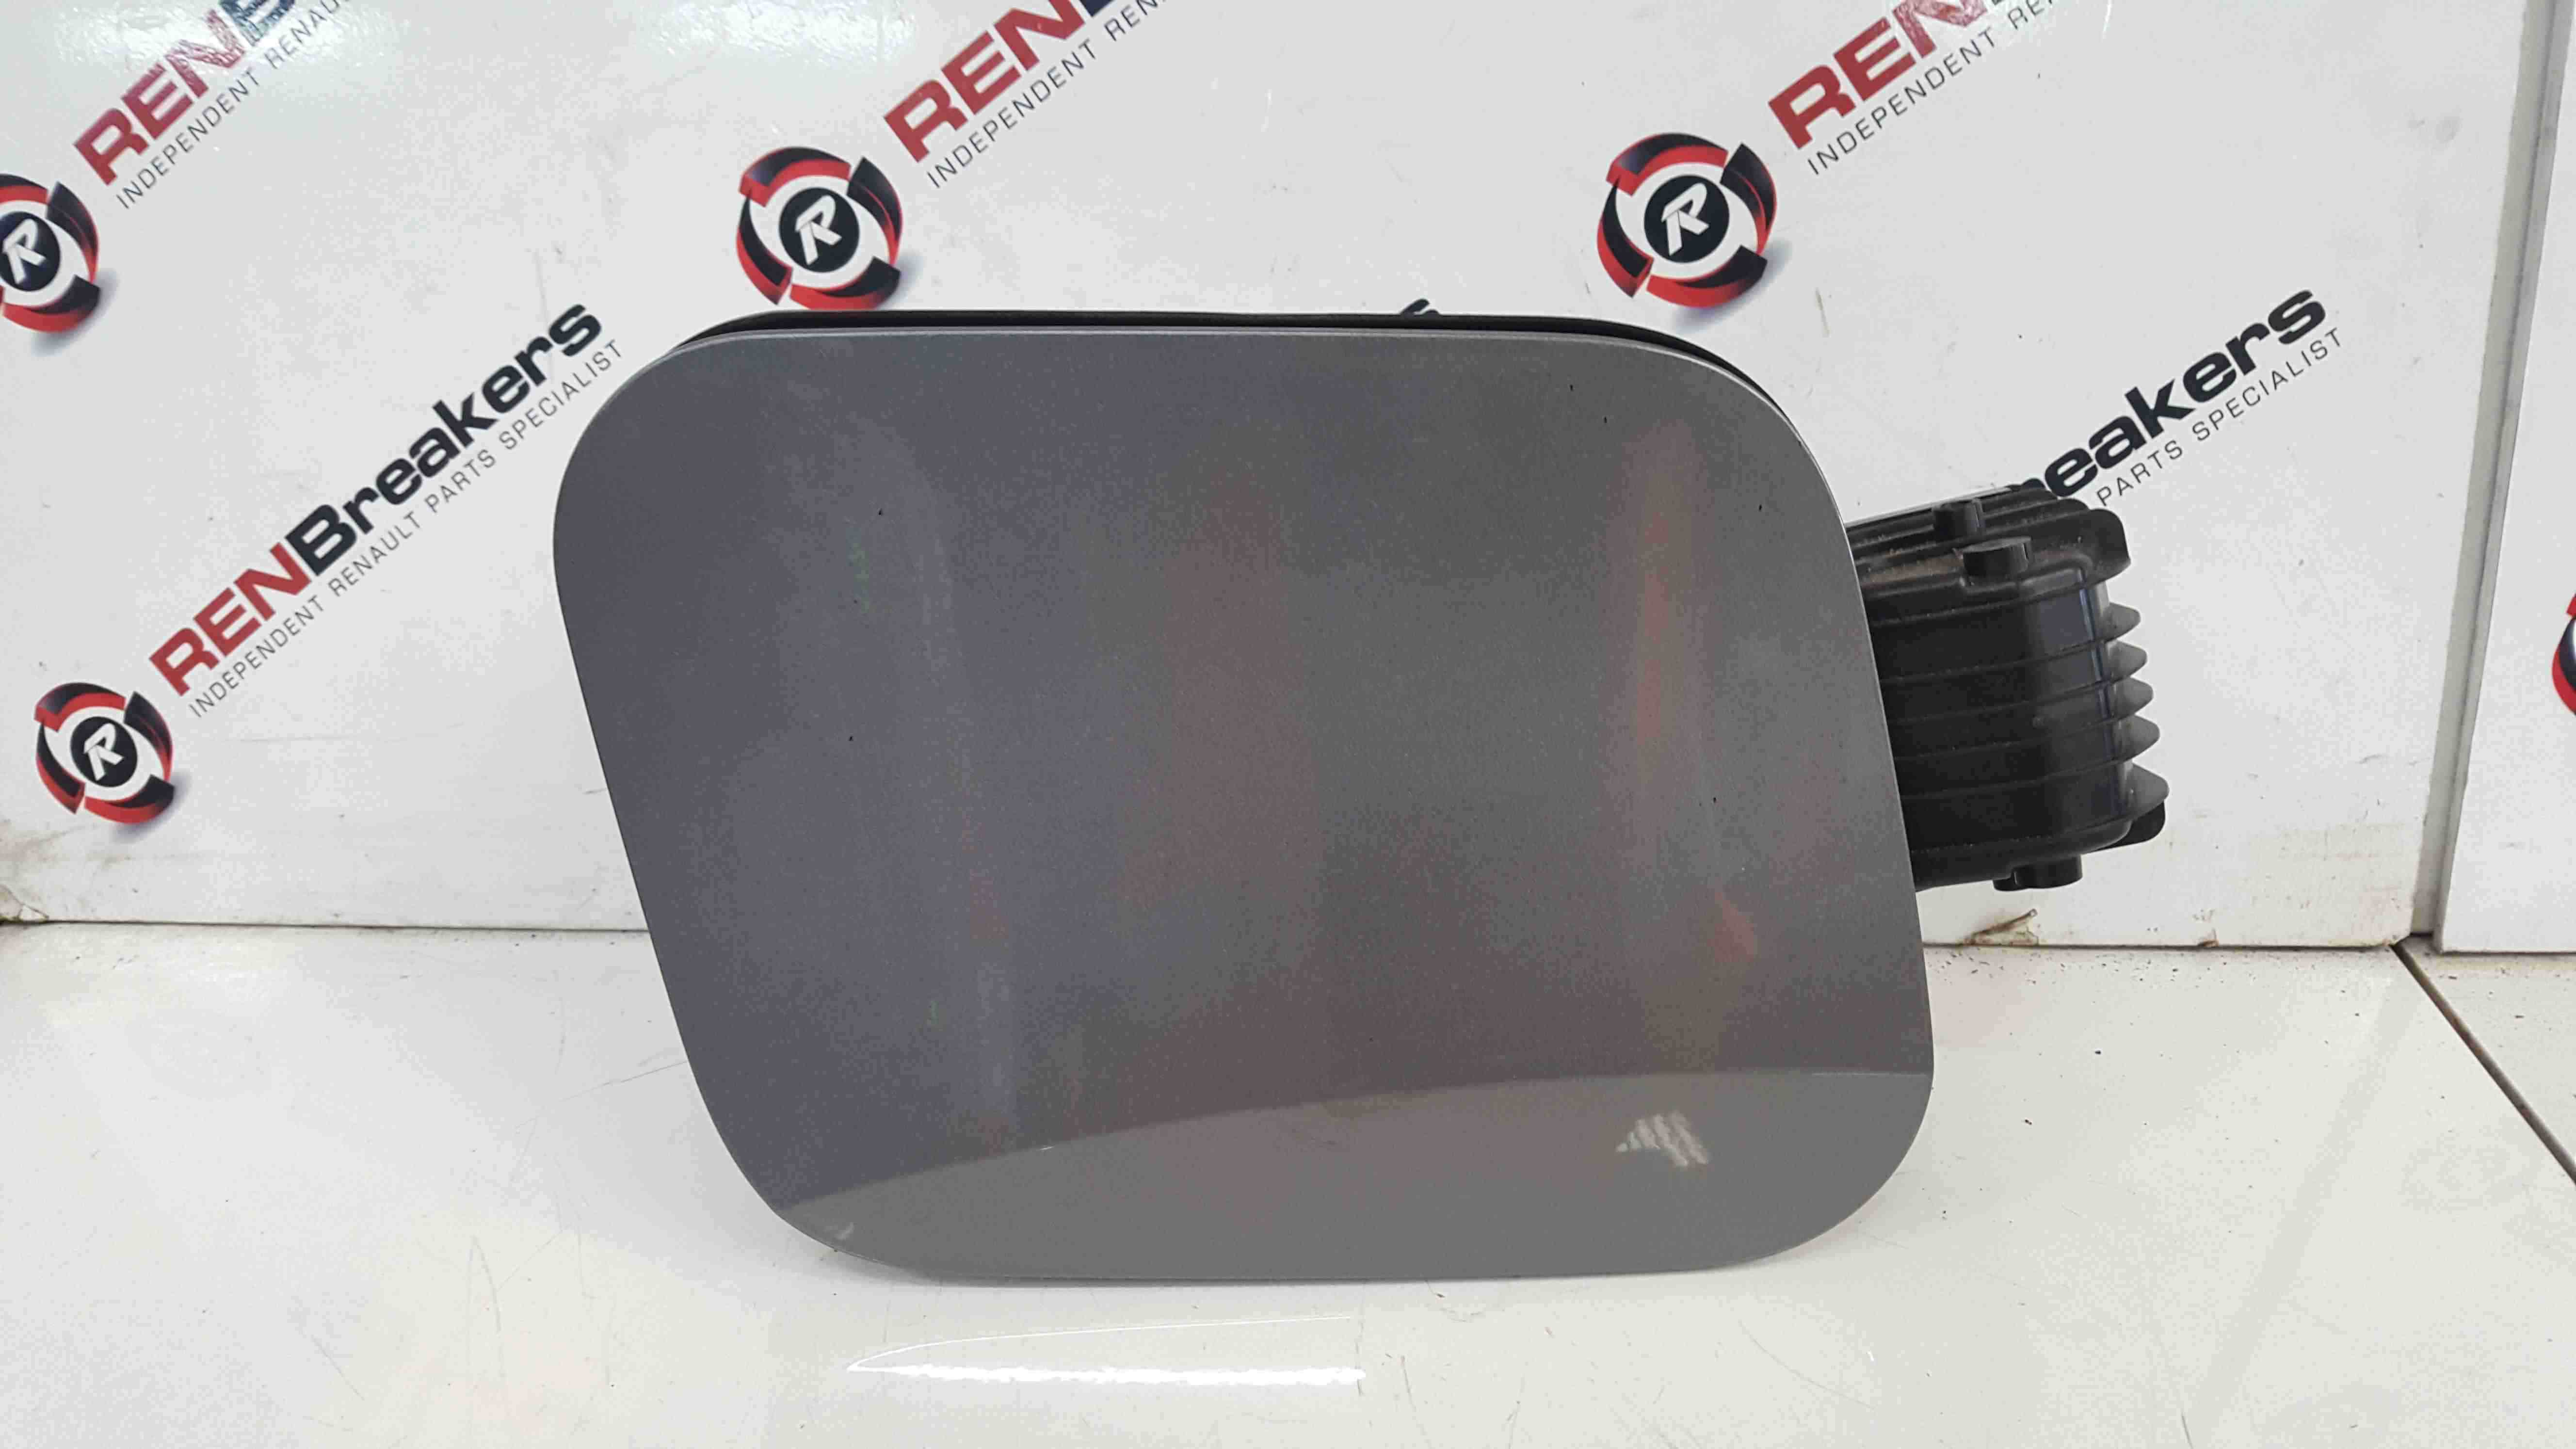 Renault Captur 2019-2021 Fuel Flap Cover + Hinges Grey BIXNK 781200081R